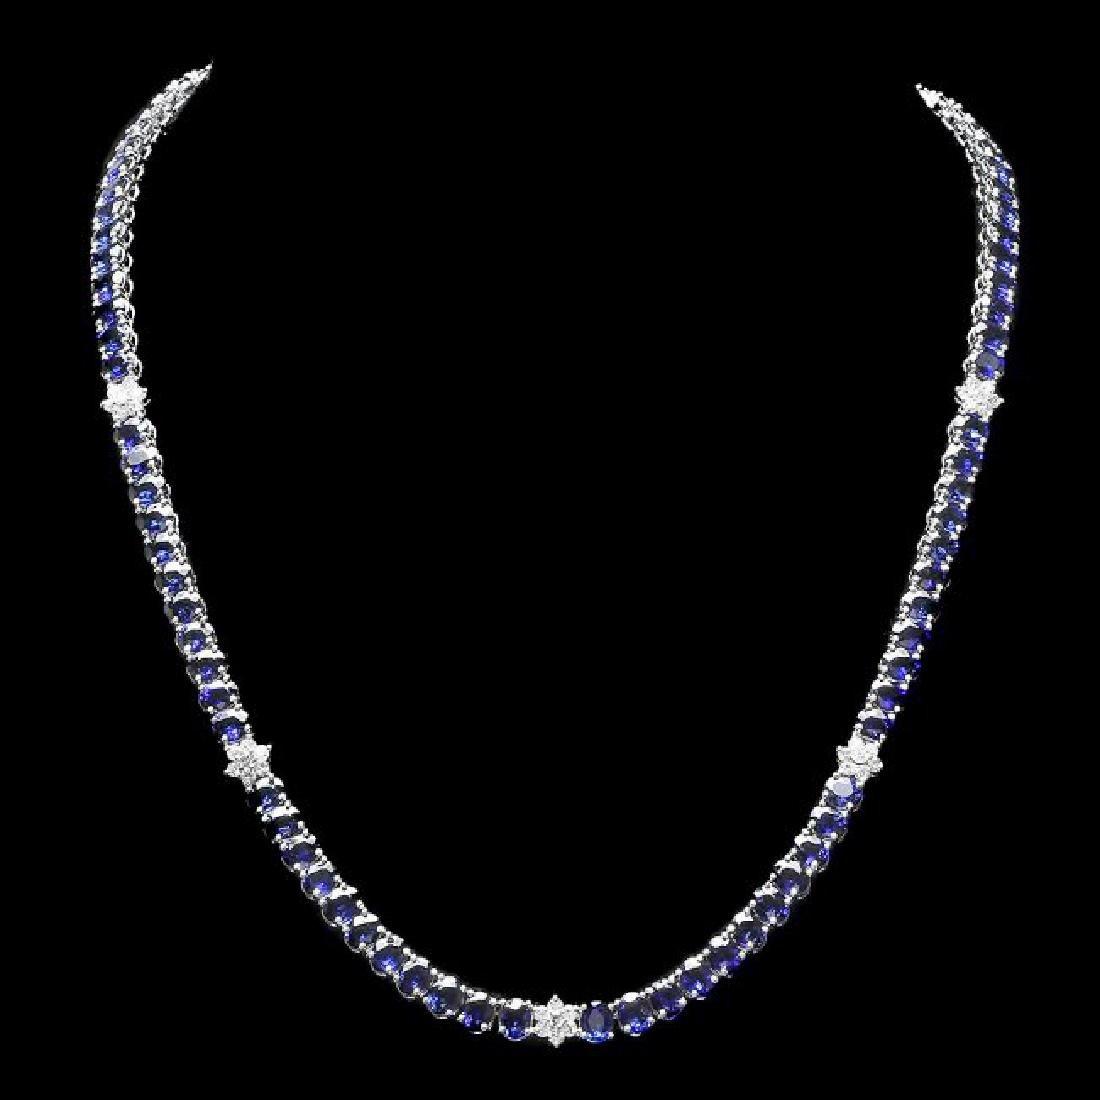 14k Gold 40.00ct Sapphire 1.30ct Diamond Necklace